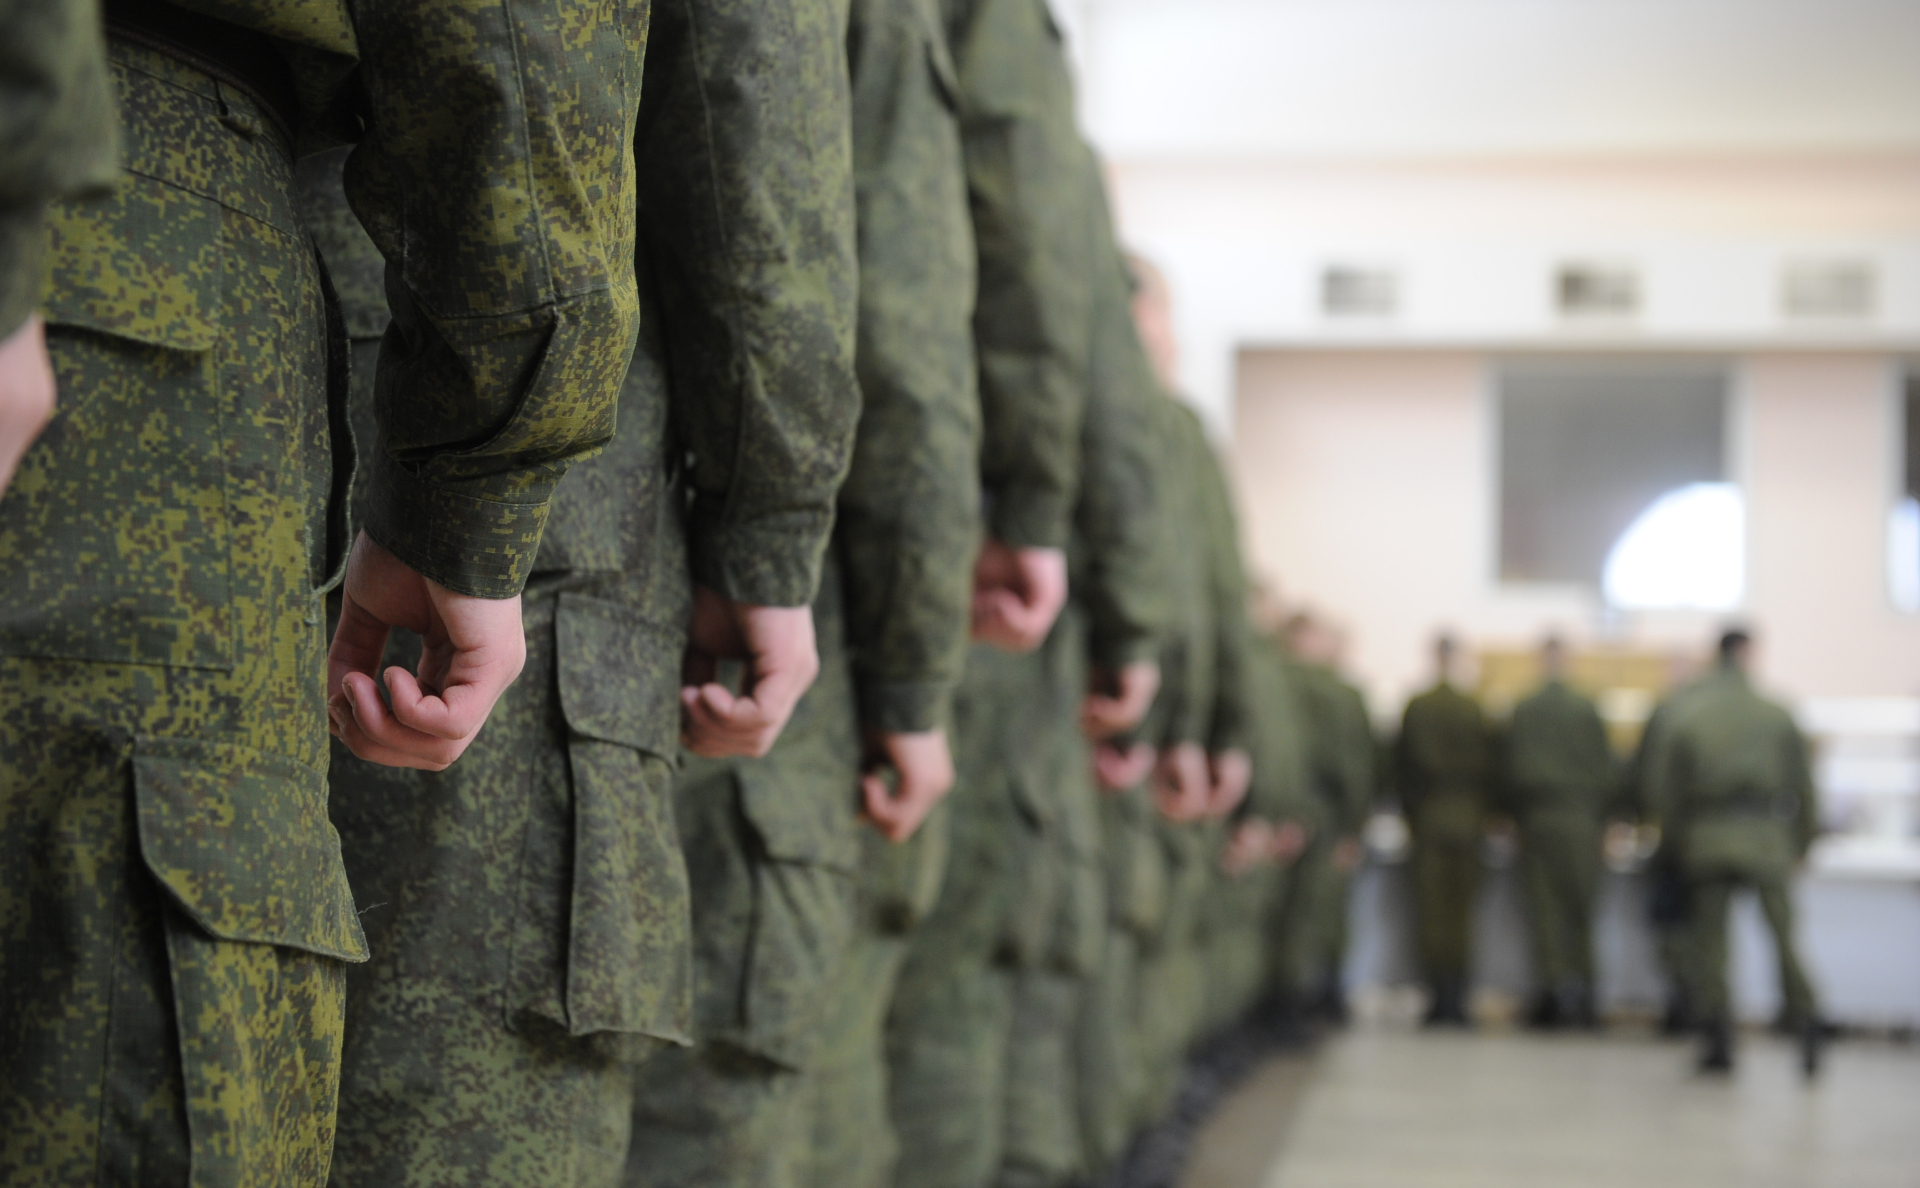 Фото: Руслан Шамуков / ИТАР-ТАСС